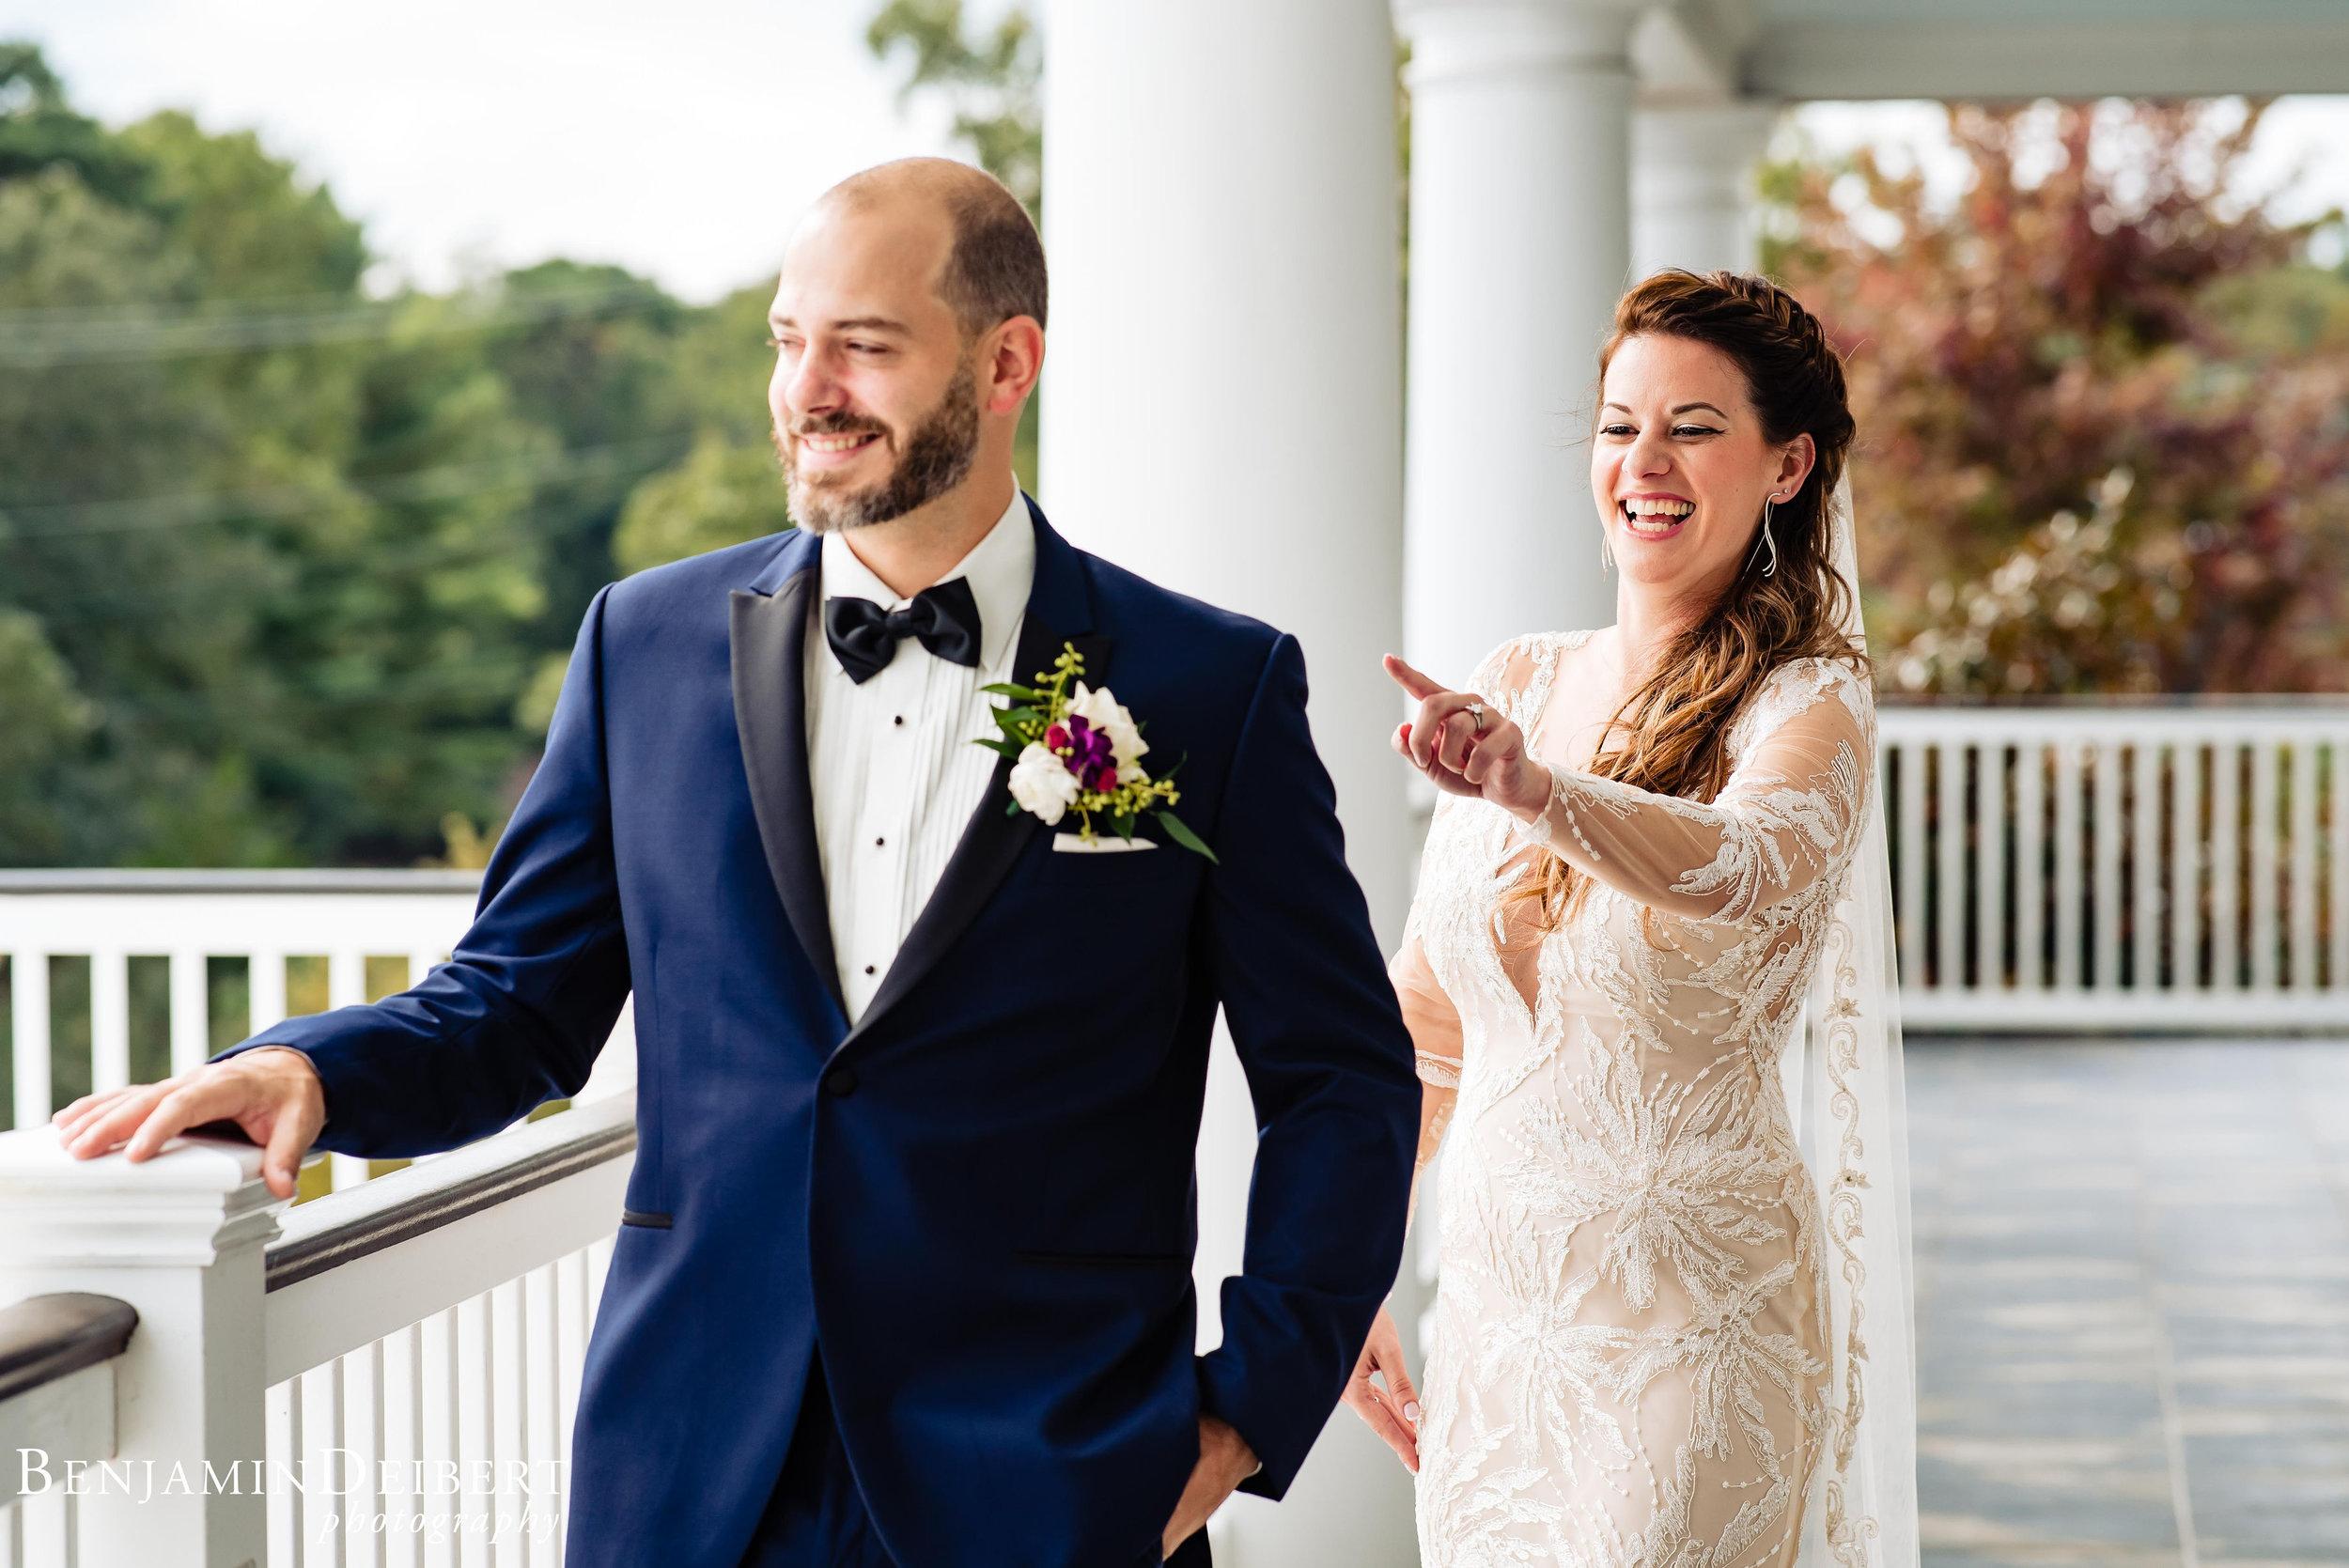 AmandaandElliott_TheCarriageHouse_Wedding-20.jpg